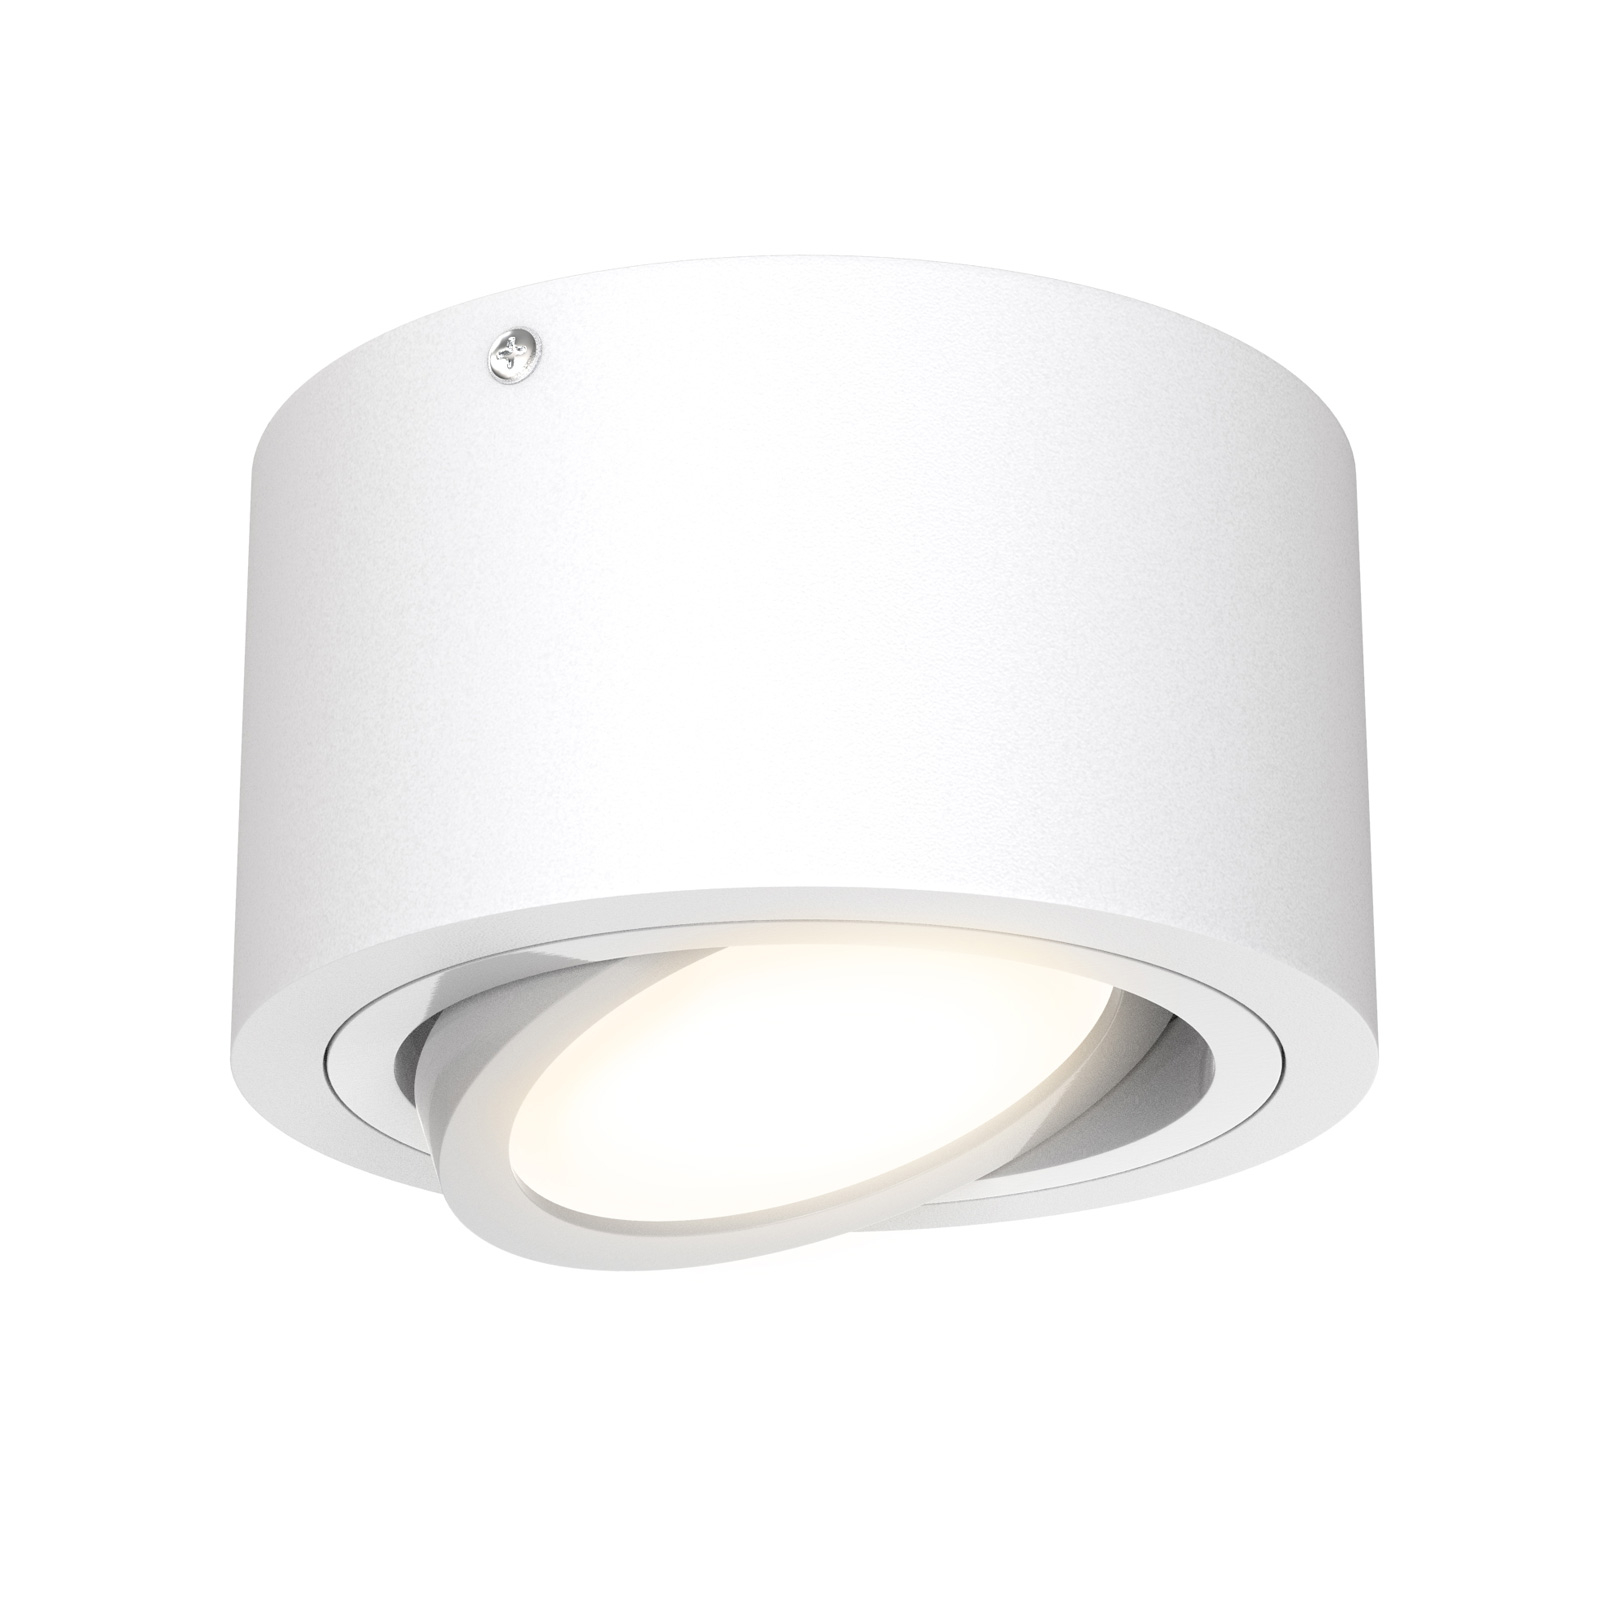 Spot sufitowy LED Tube 7121-016 biały